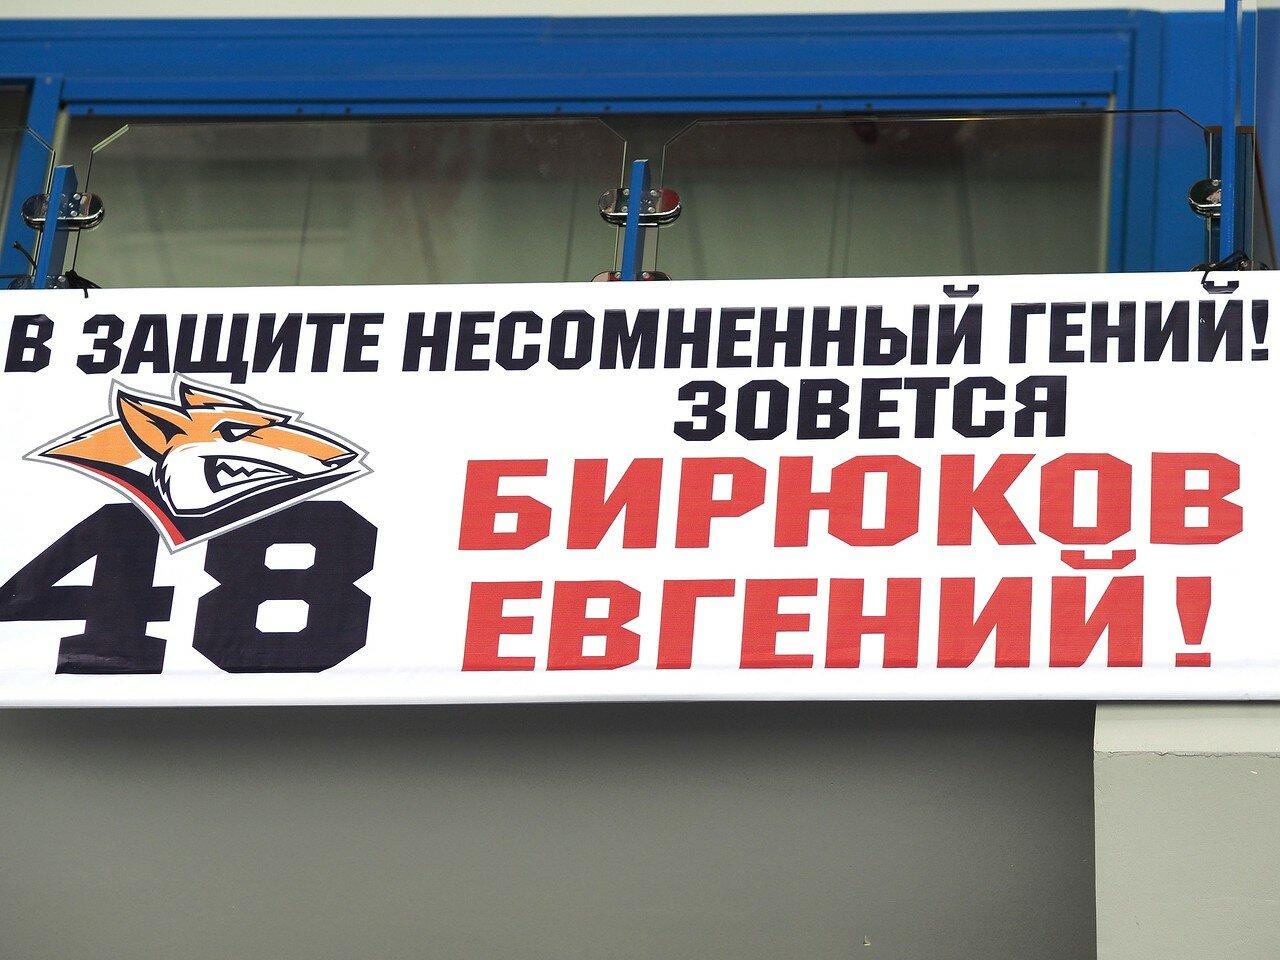 155Восток 1/2 плей-офф Металлург - Сибирь 08.03.2016